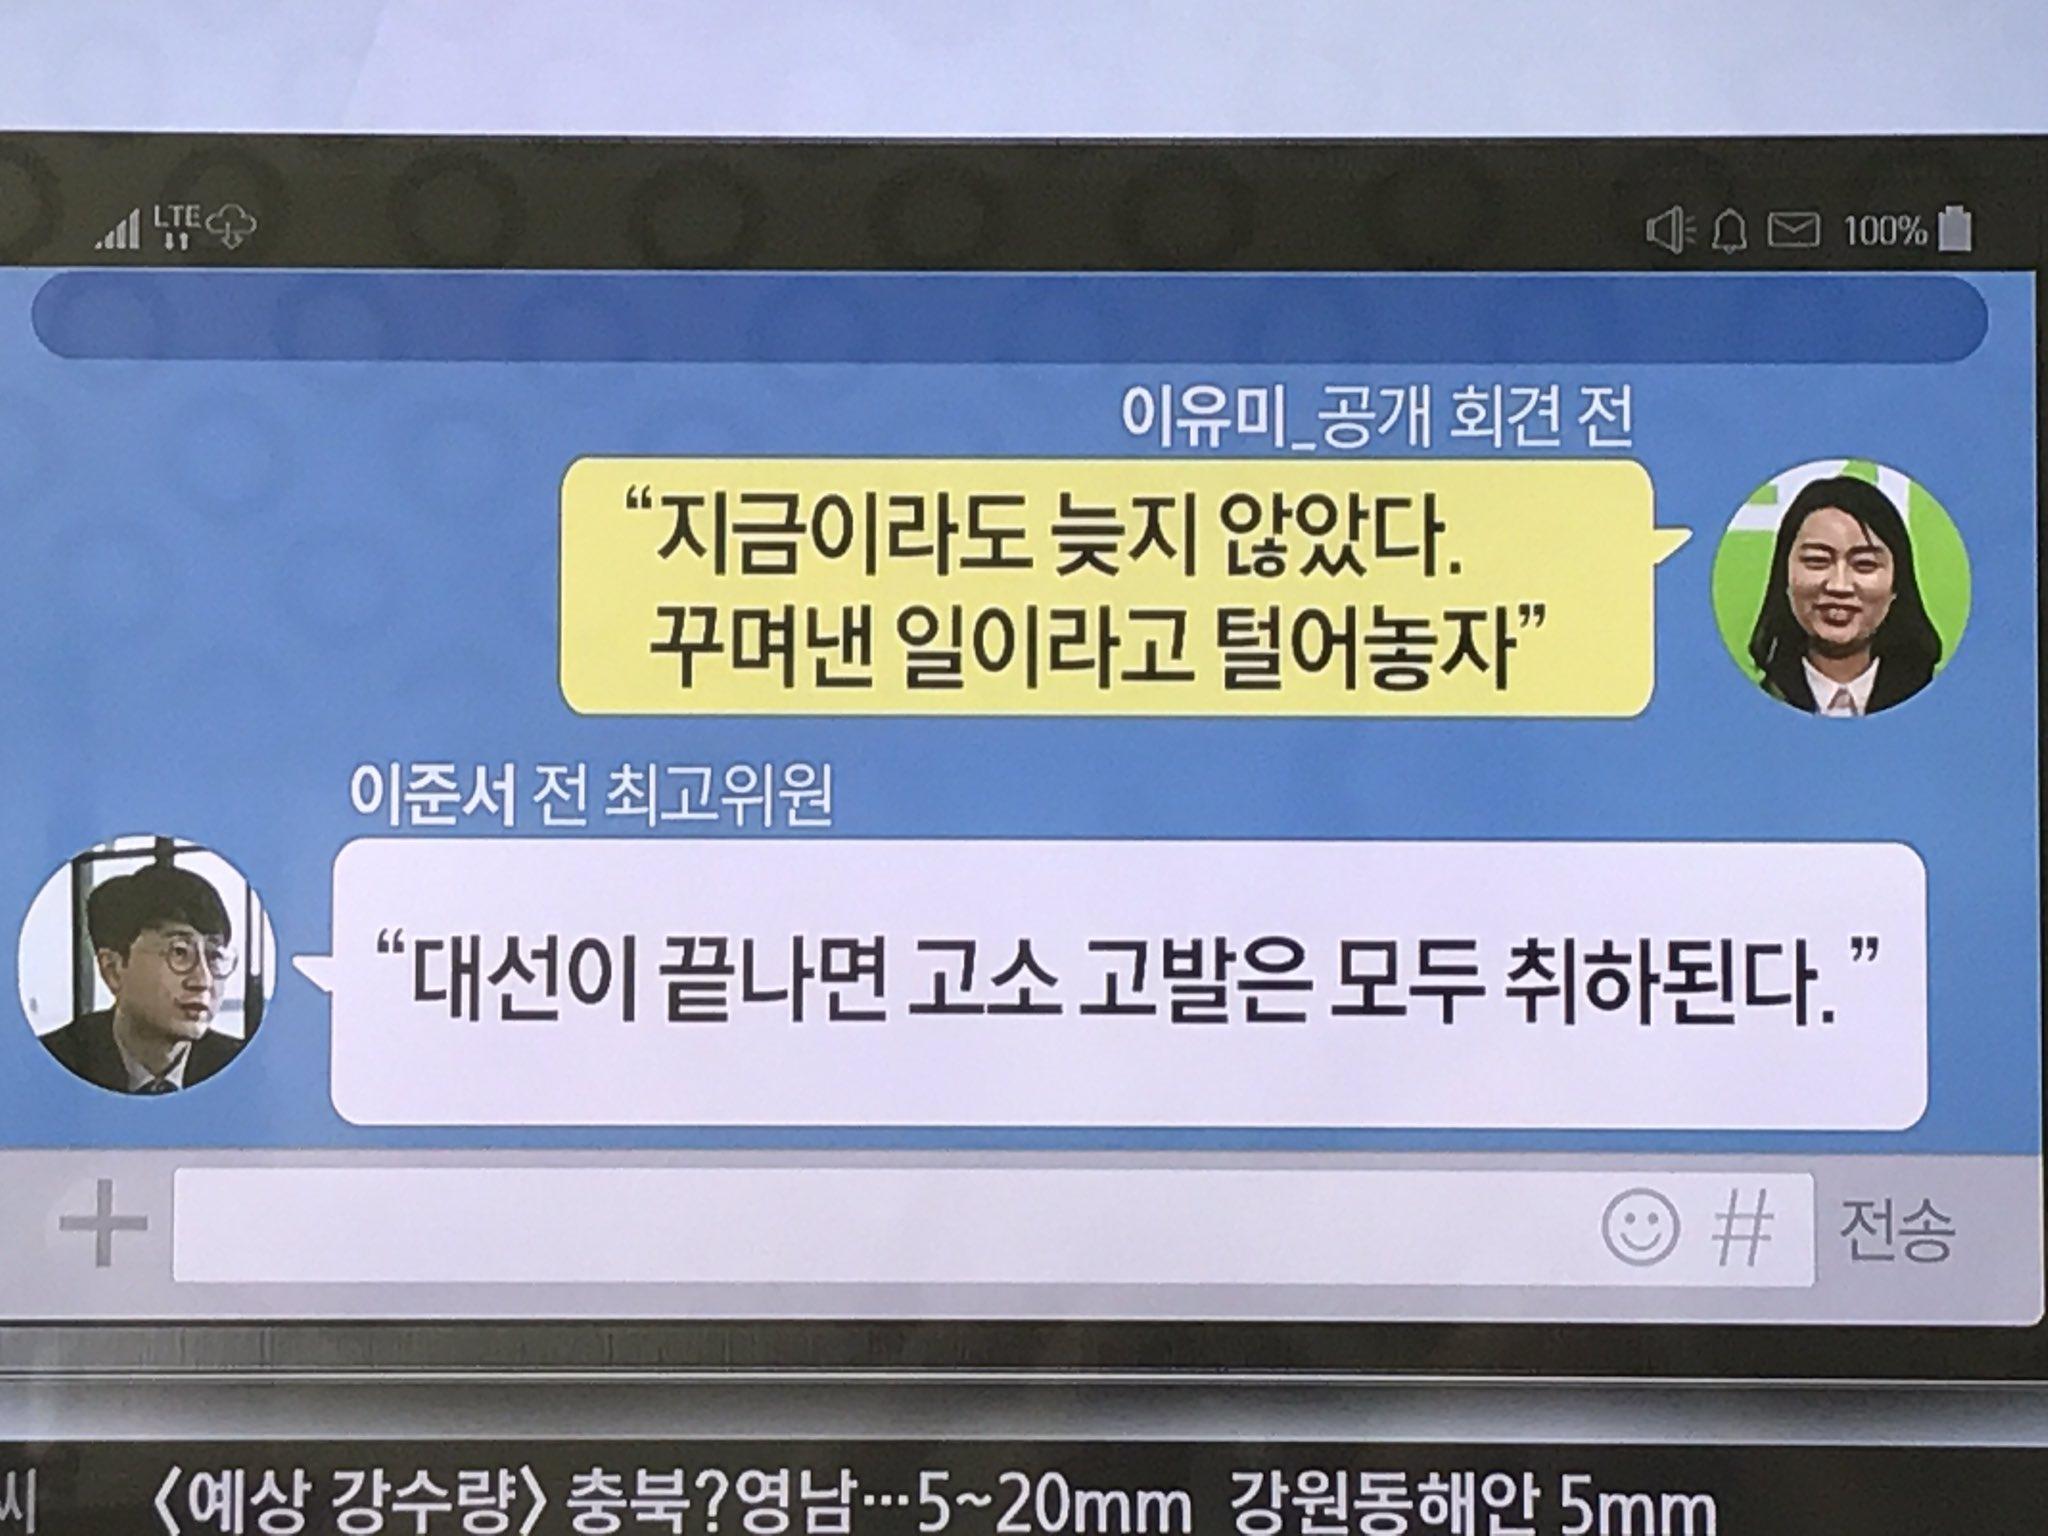 Thumbnail for 국민의당 대선 공작 게이트 SNS반응 (feat 이유미, 이준서, 안철수, 이용주)